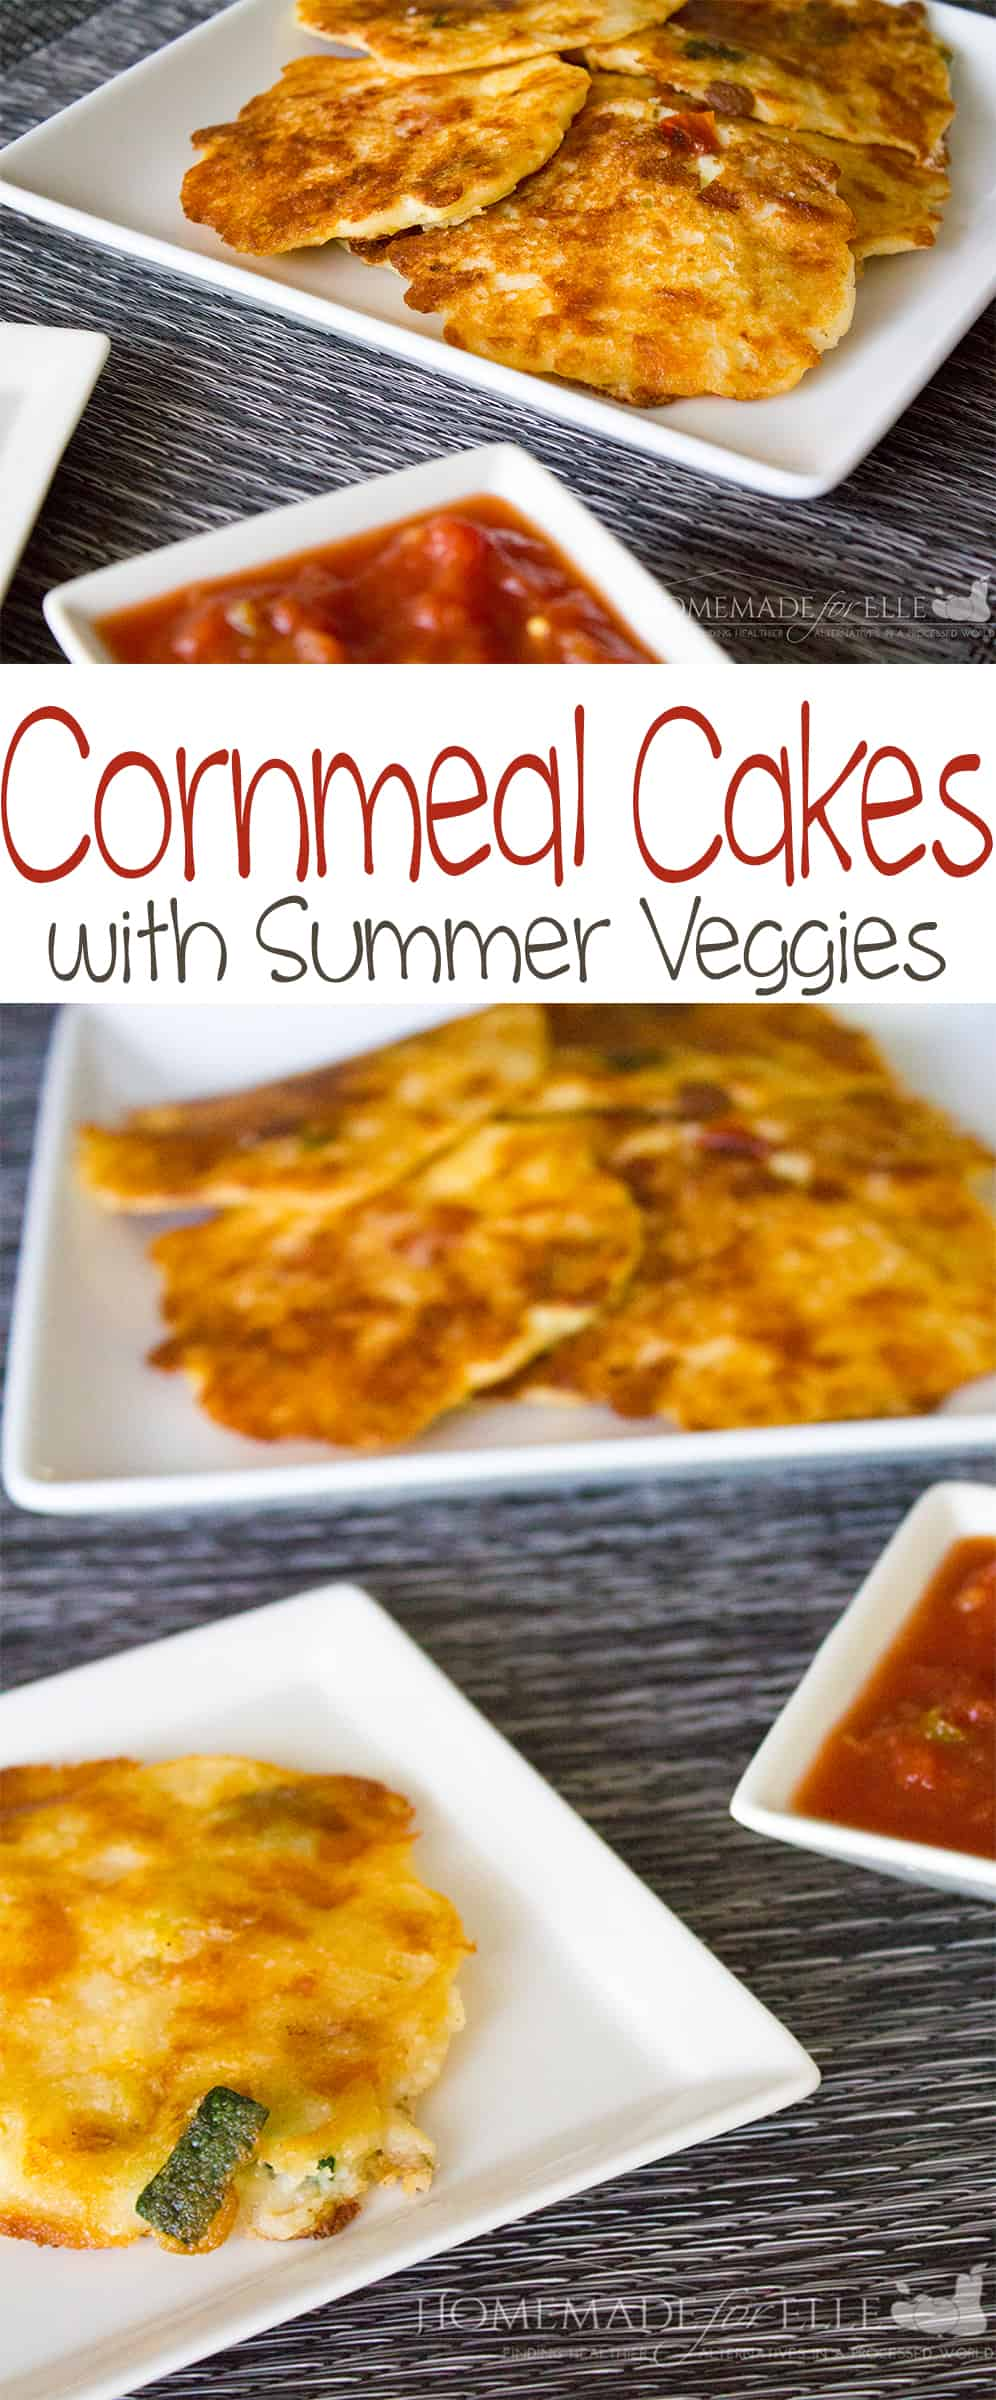 Cornmeal Cake with Summer Veggies